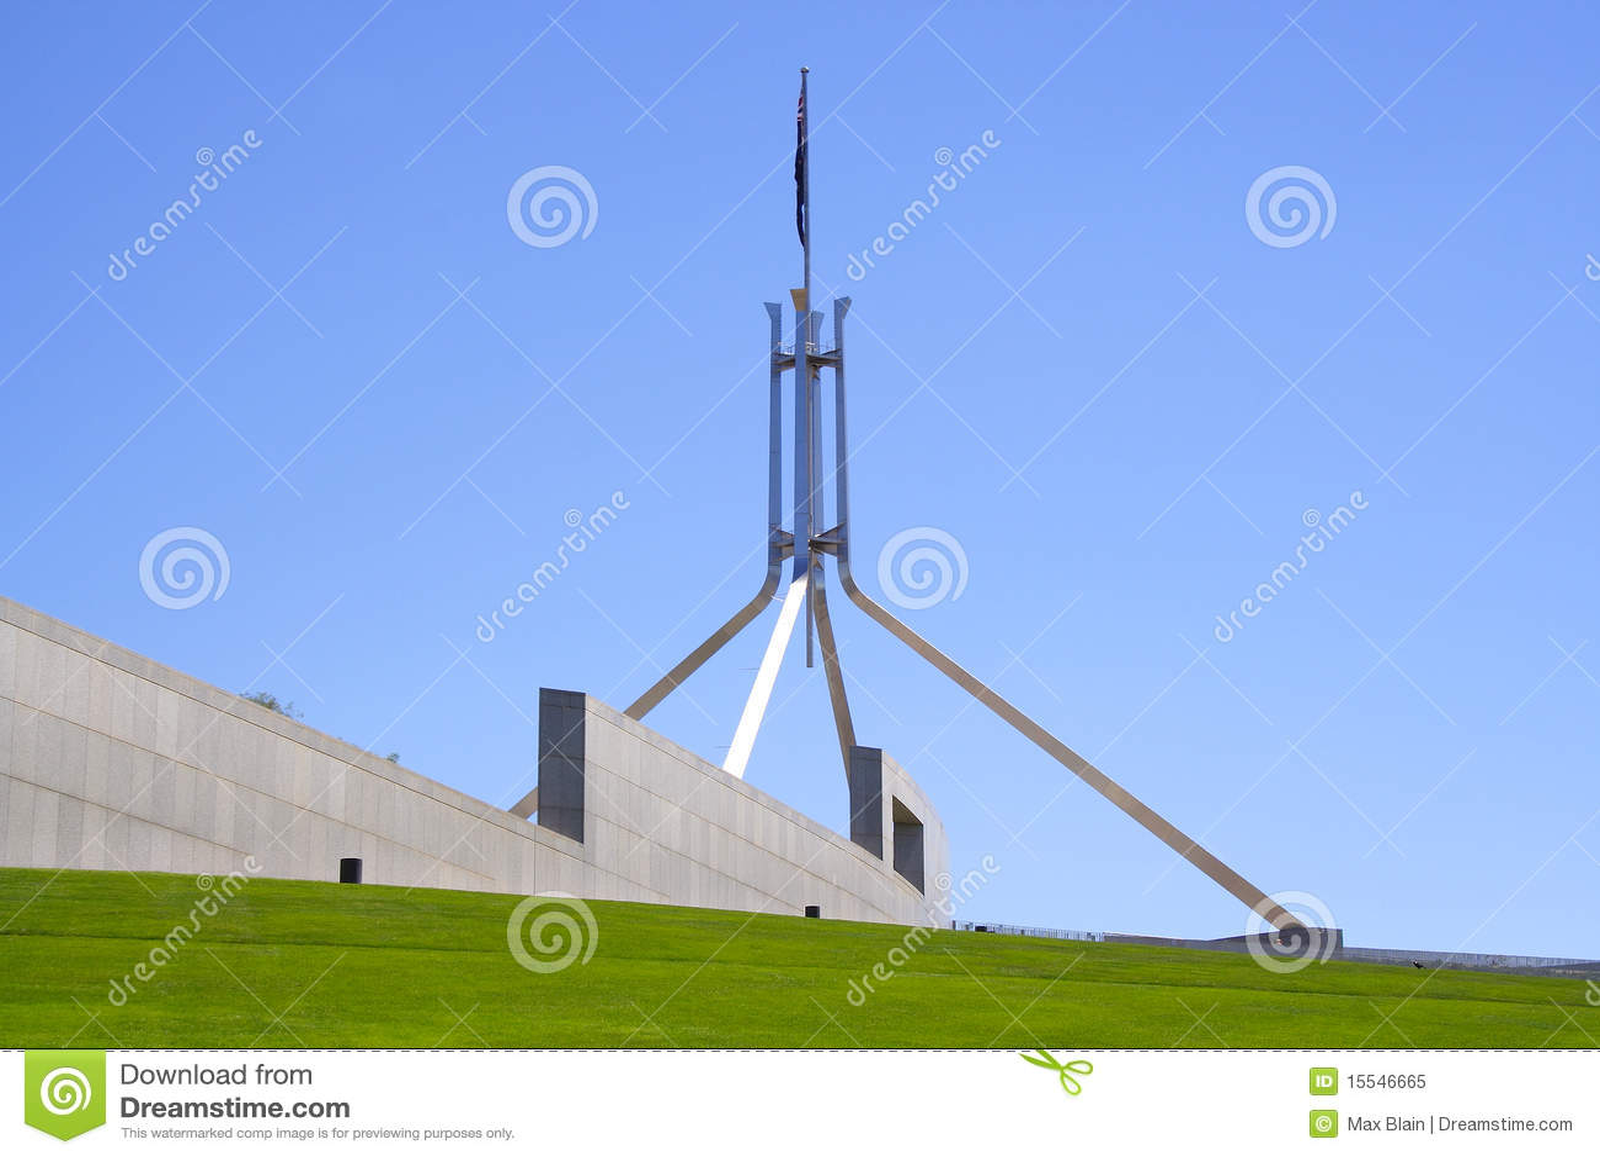 Das Parlament bringen unter